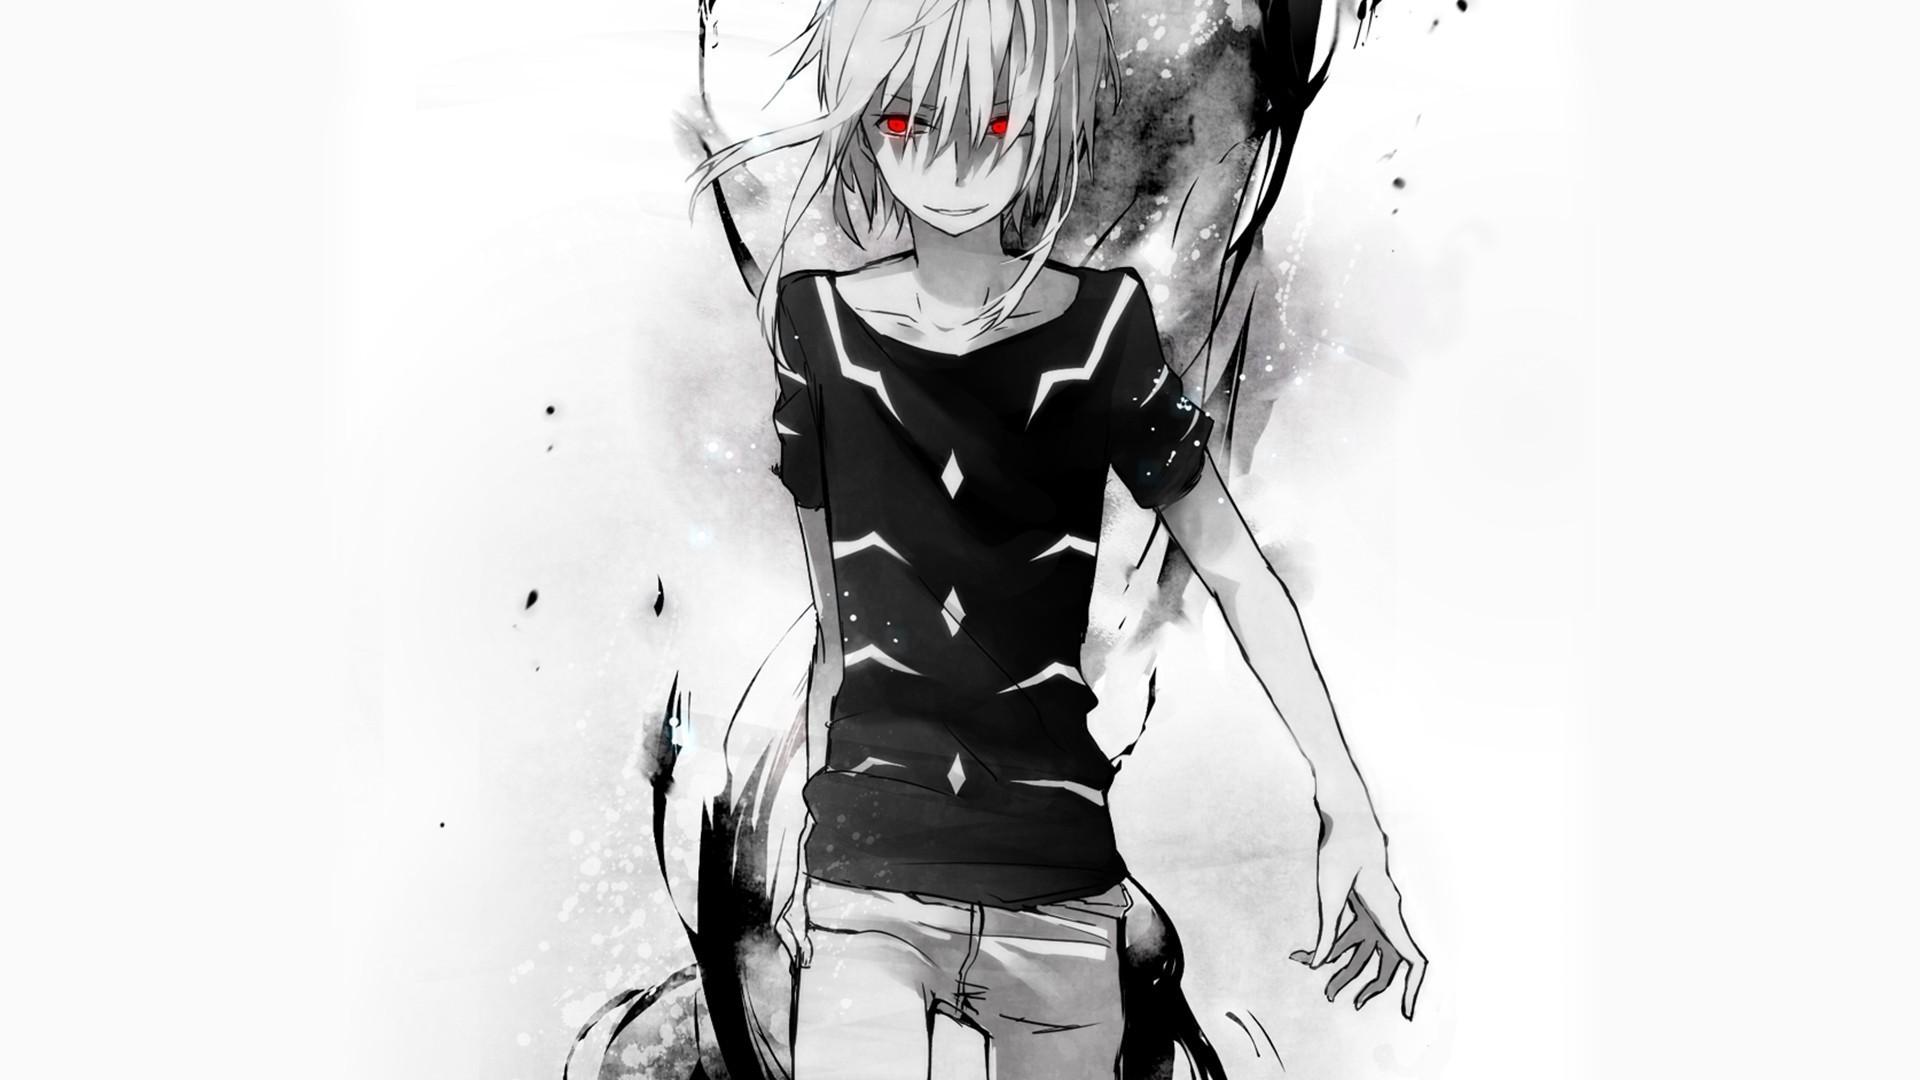 To Aru Kagaku No Railgun, Accelerator, Red Eyes, Anime. Anime Wallpaper HD